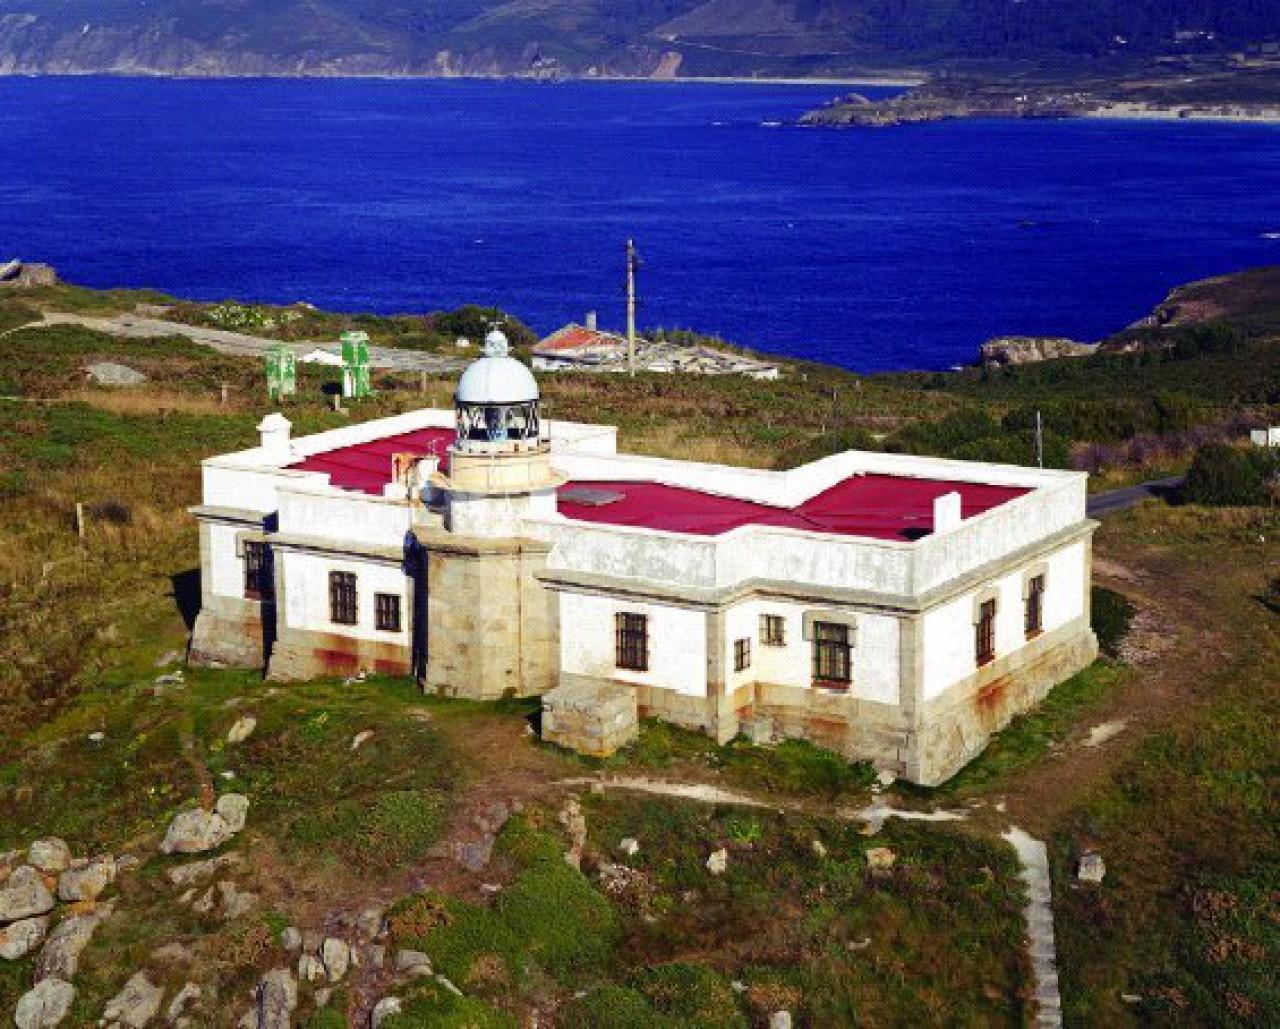 Faro do Cabo Prioiro